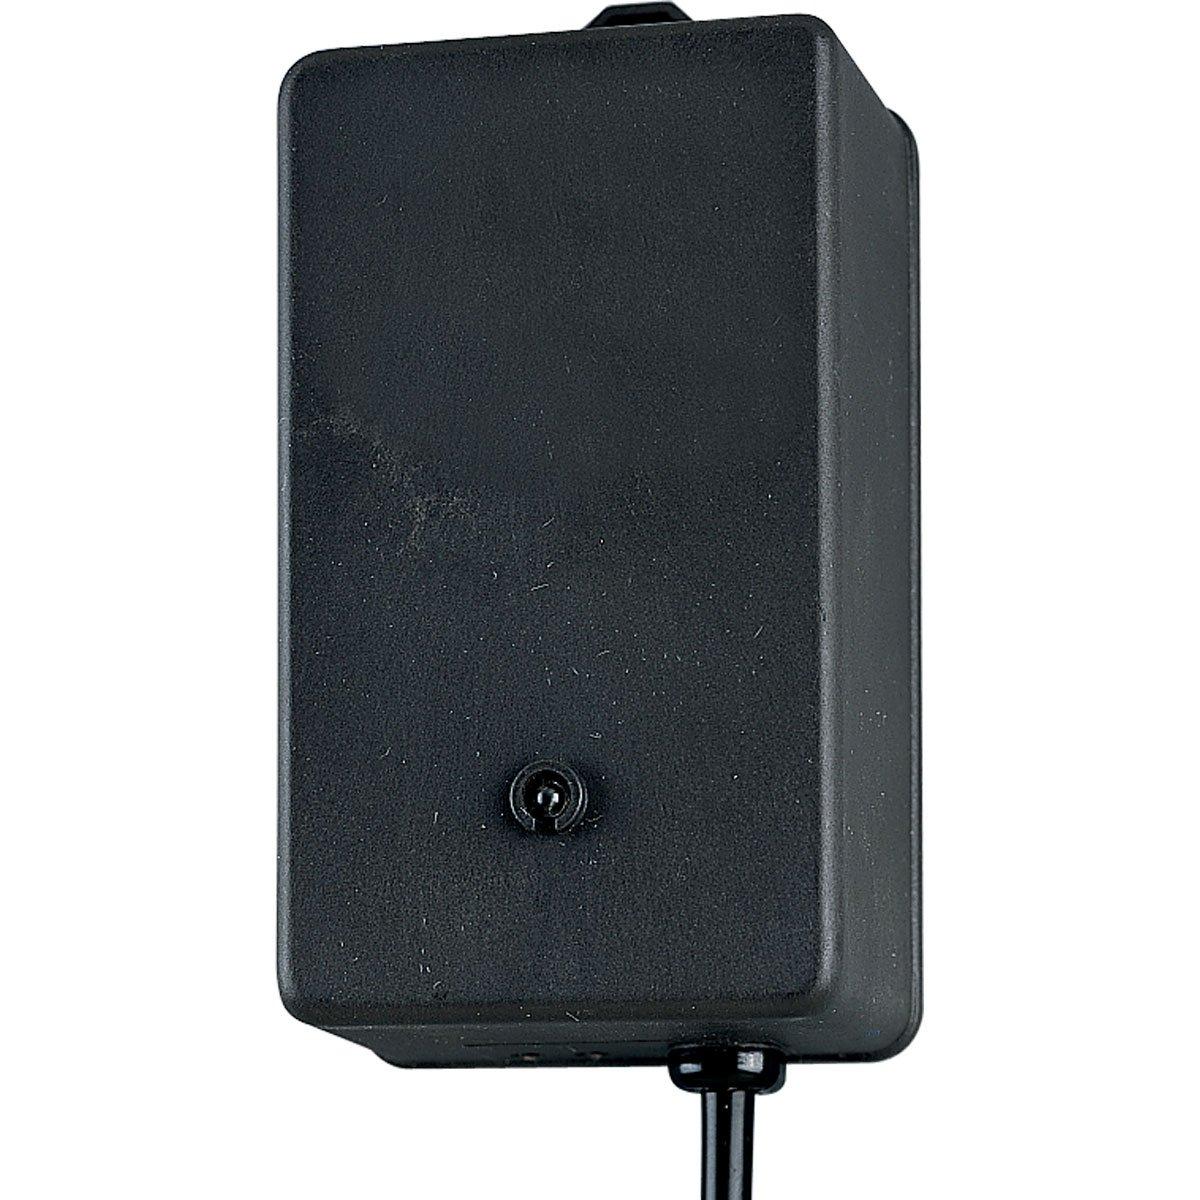 Progress Lighting P8517-31 100-Watt Electronic Transformer with Integral Photo-Cell, Black